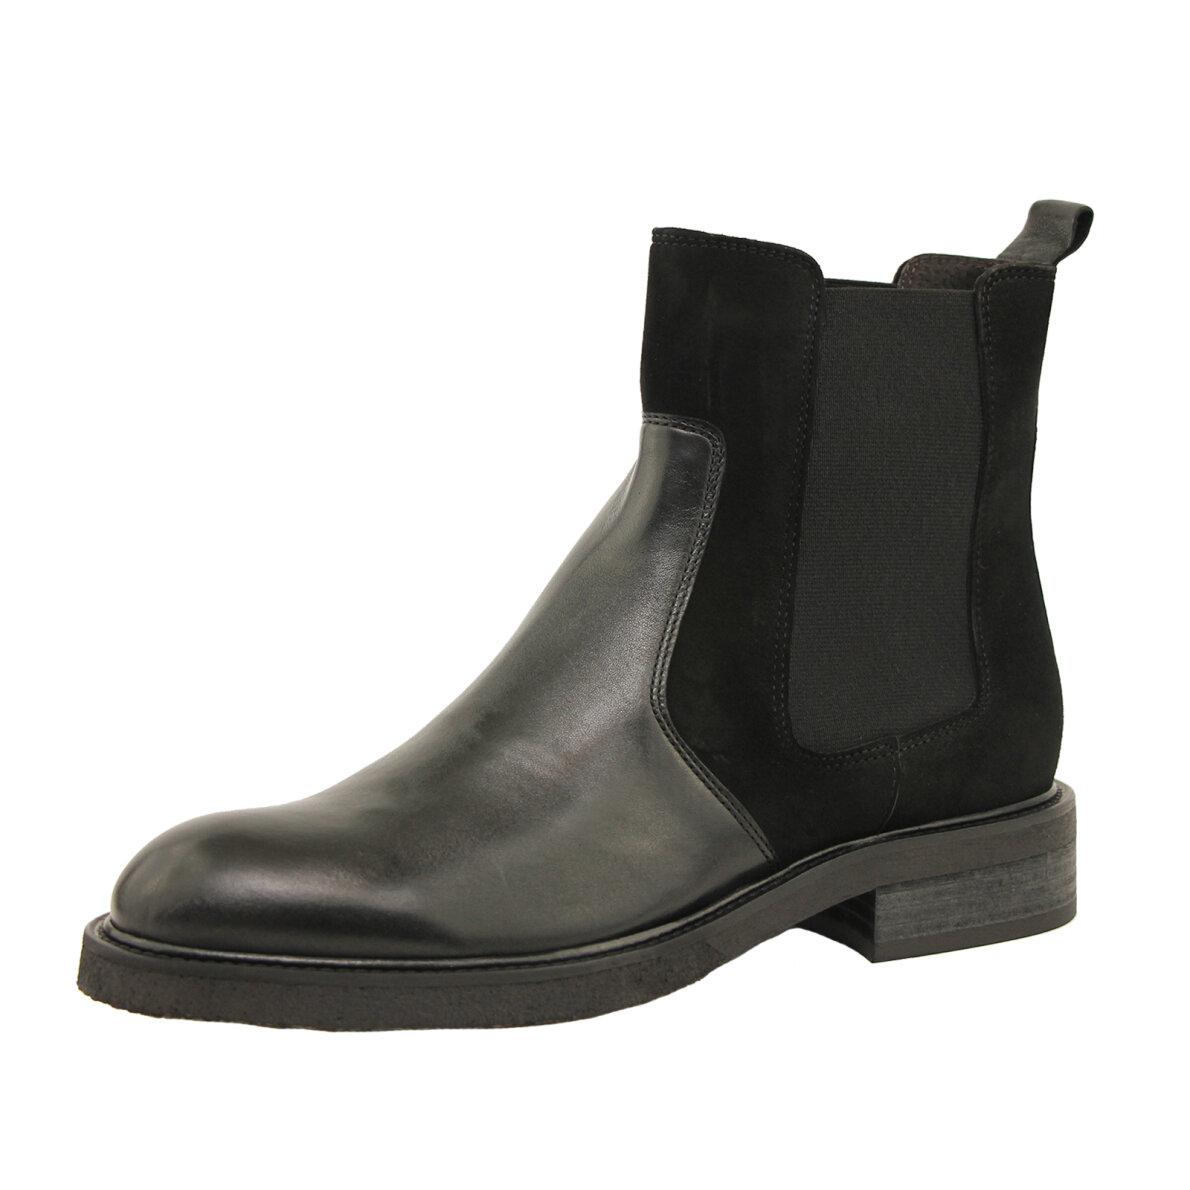 8700ddaa ... Billi Bi - Billi Bi 7424 Sort Chelsea Støvle i skind og ruskind